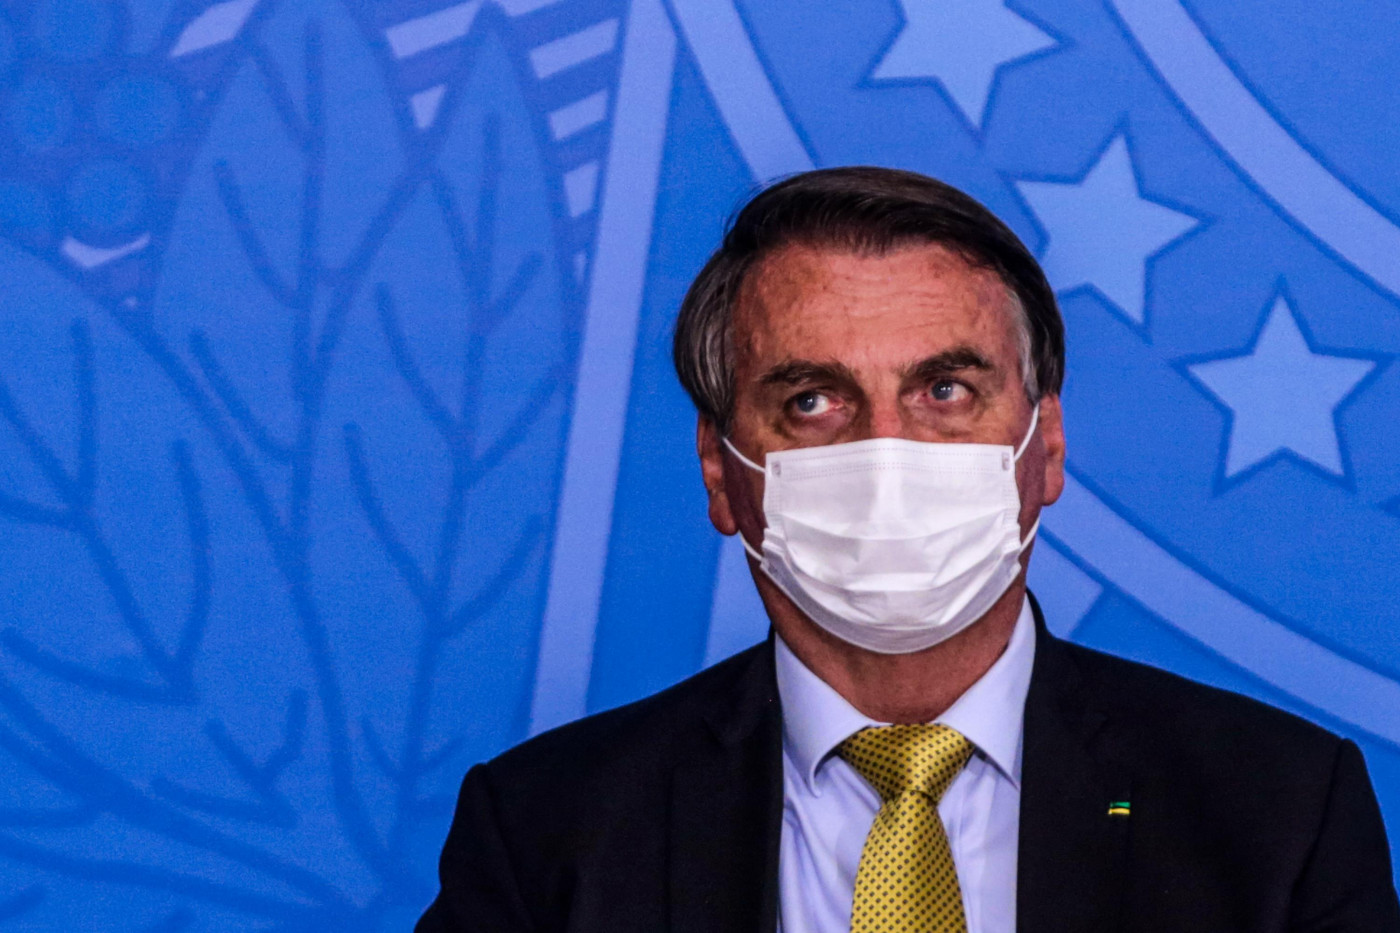 O presidente da república, Jair Bolsonaro, usa terno preto, gravata verde e camisa e máscara branca